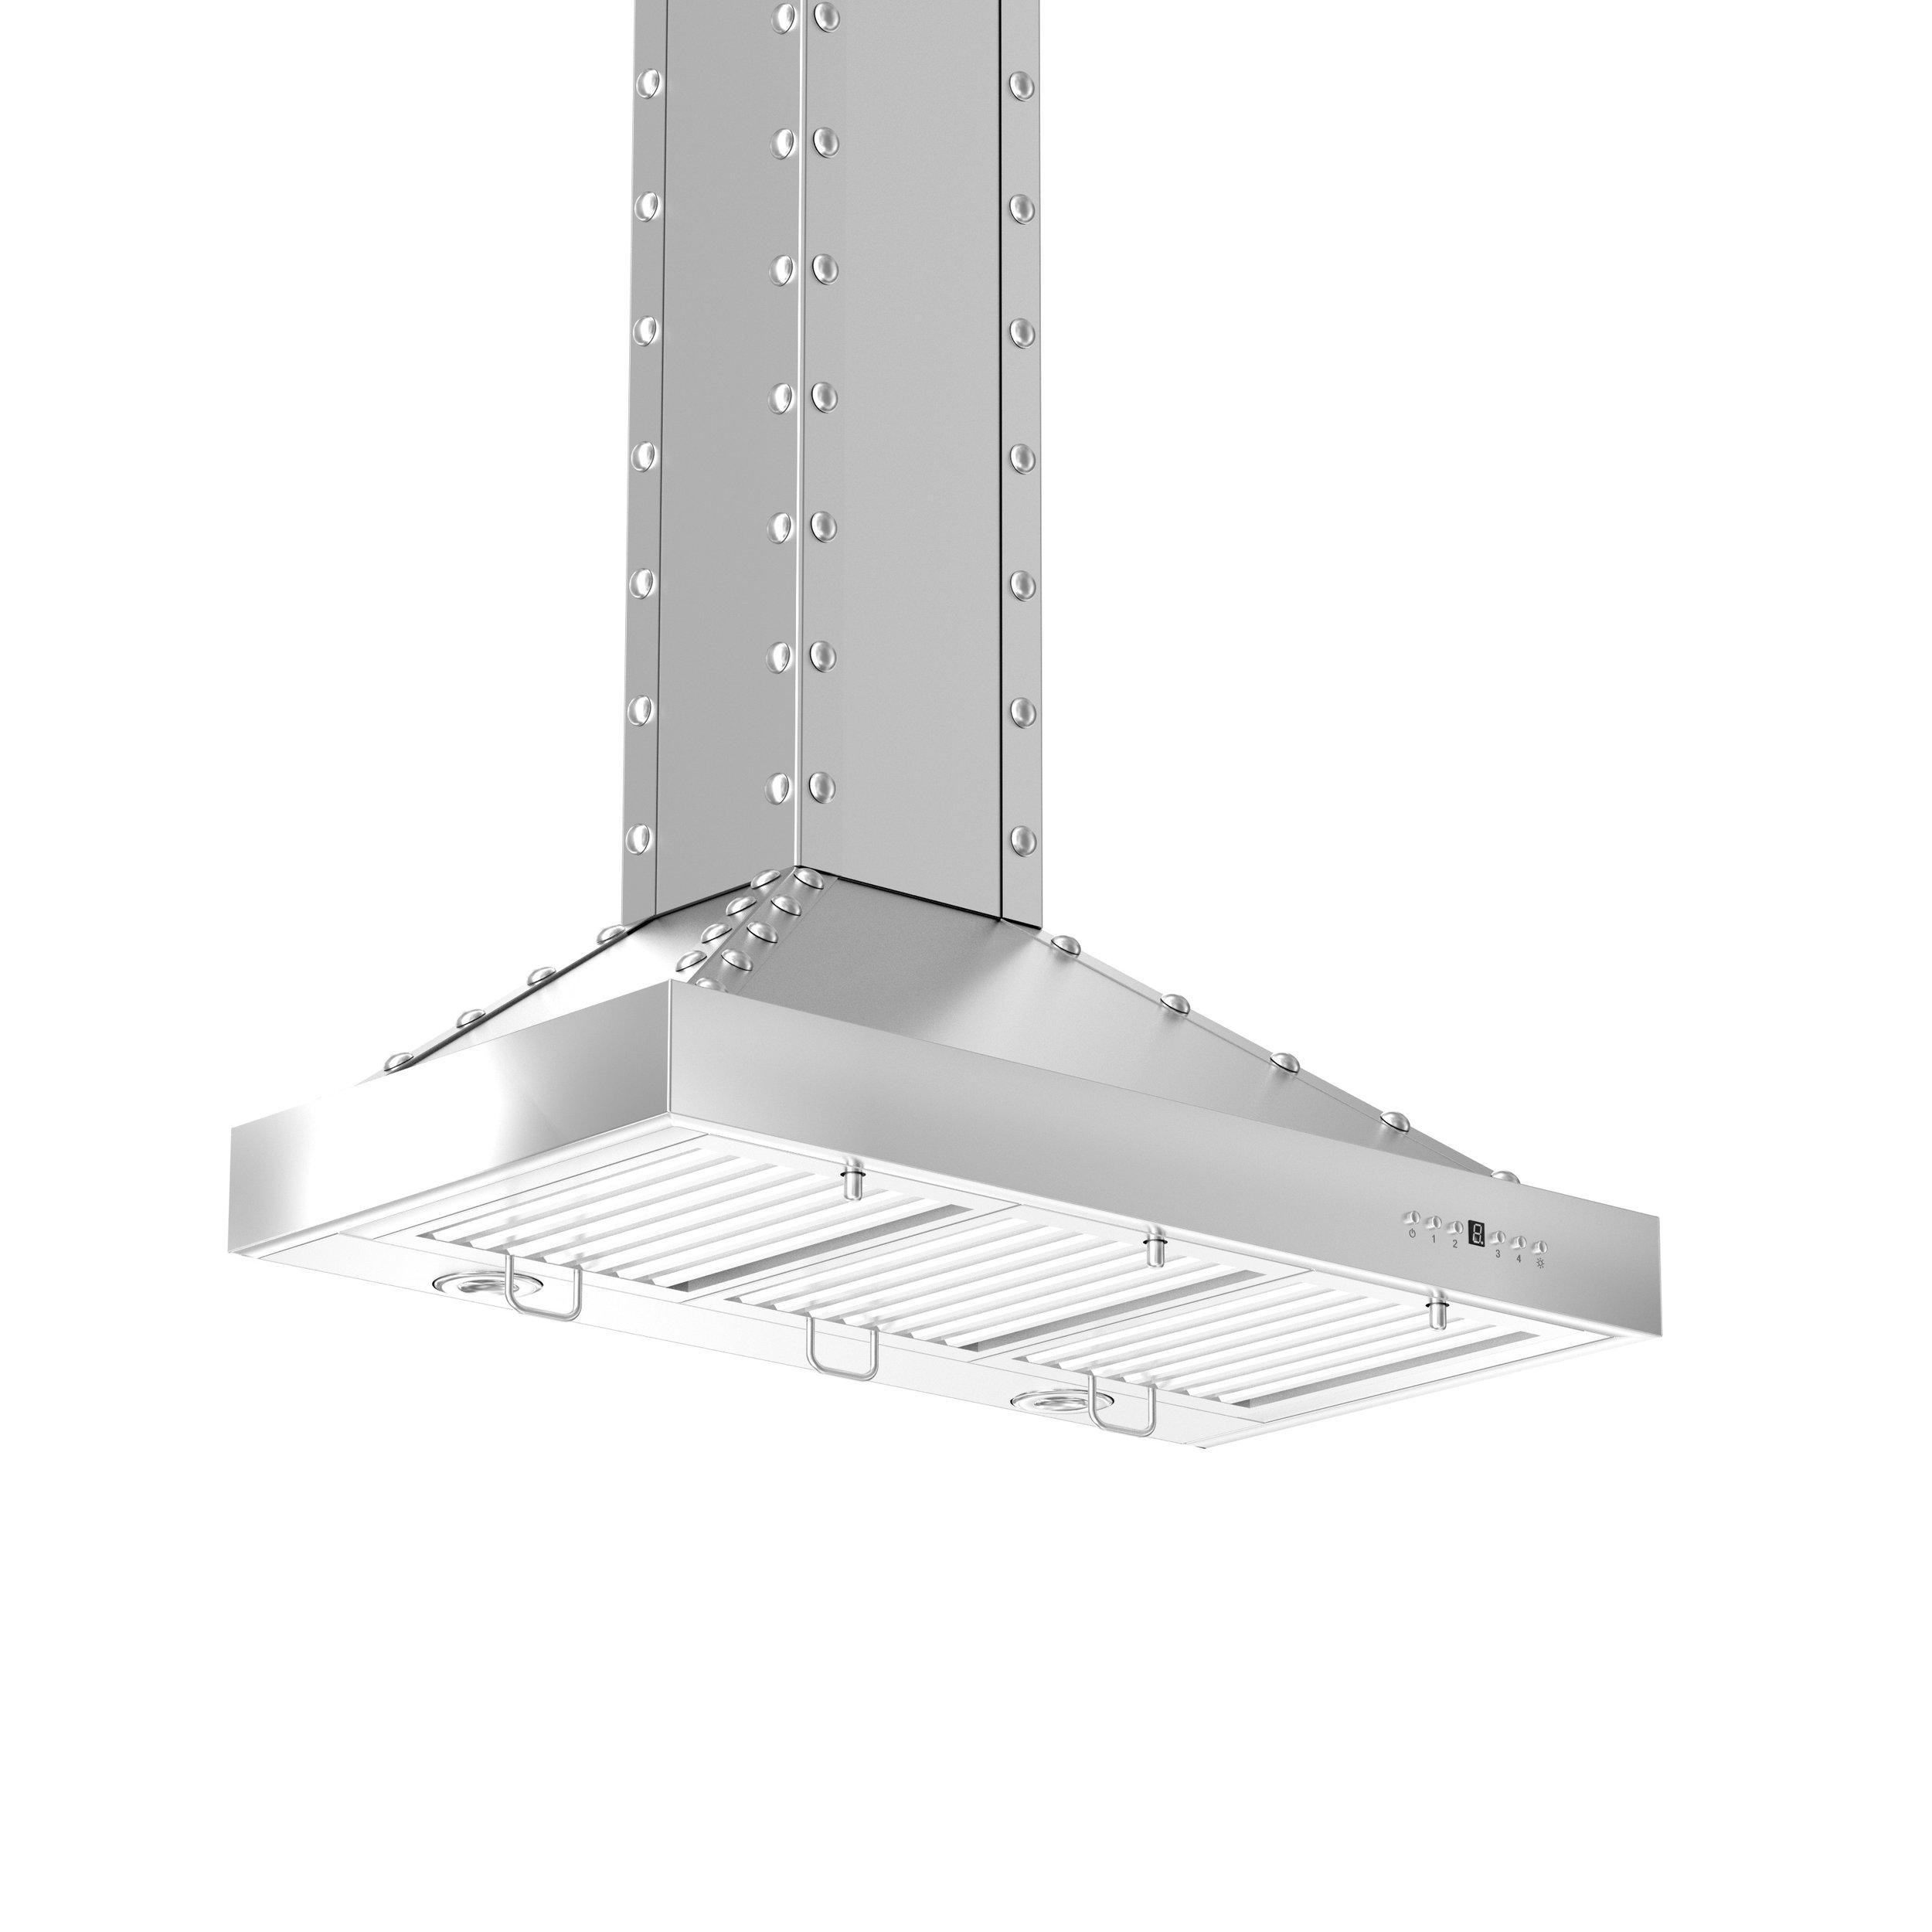 zline-stainless-steel-wall-mounted-range-hood-KB2-4SSXS-side-under.jpeg